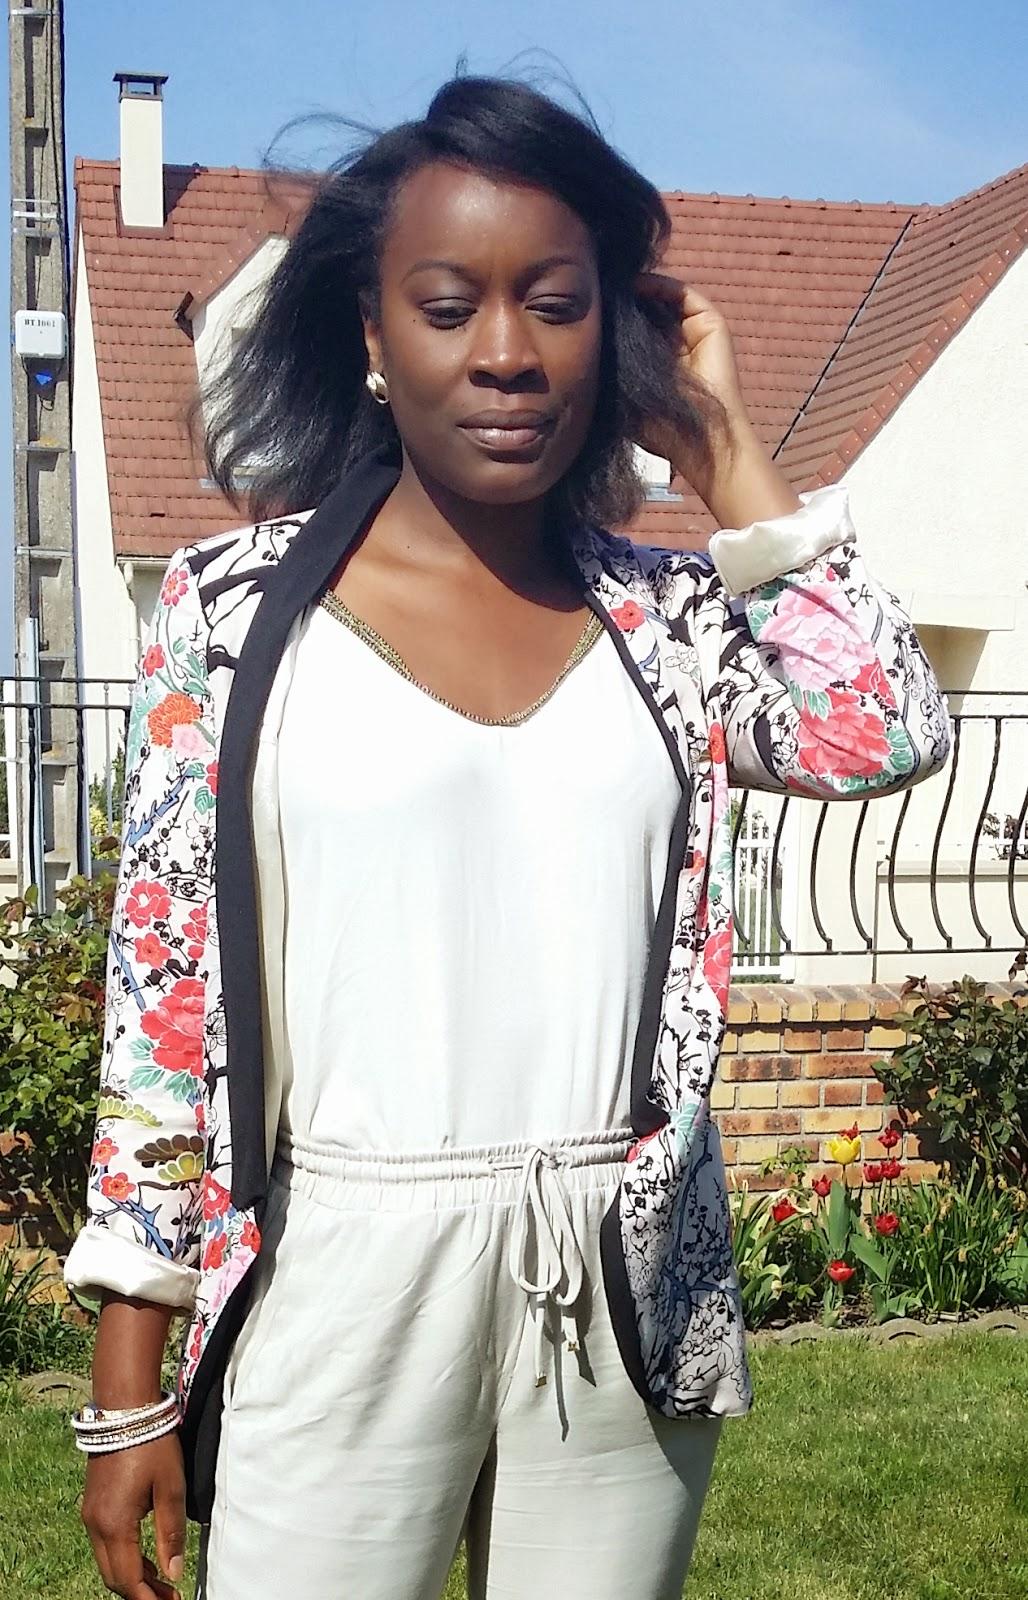 blog-mode-tenuedujour-tenuesimple-petitsbudgets-petitbudget-floweroutfit-tenuefleurie-naturalhair-cheveuxcrépus-petitprix